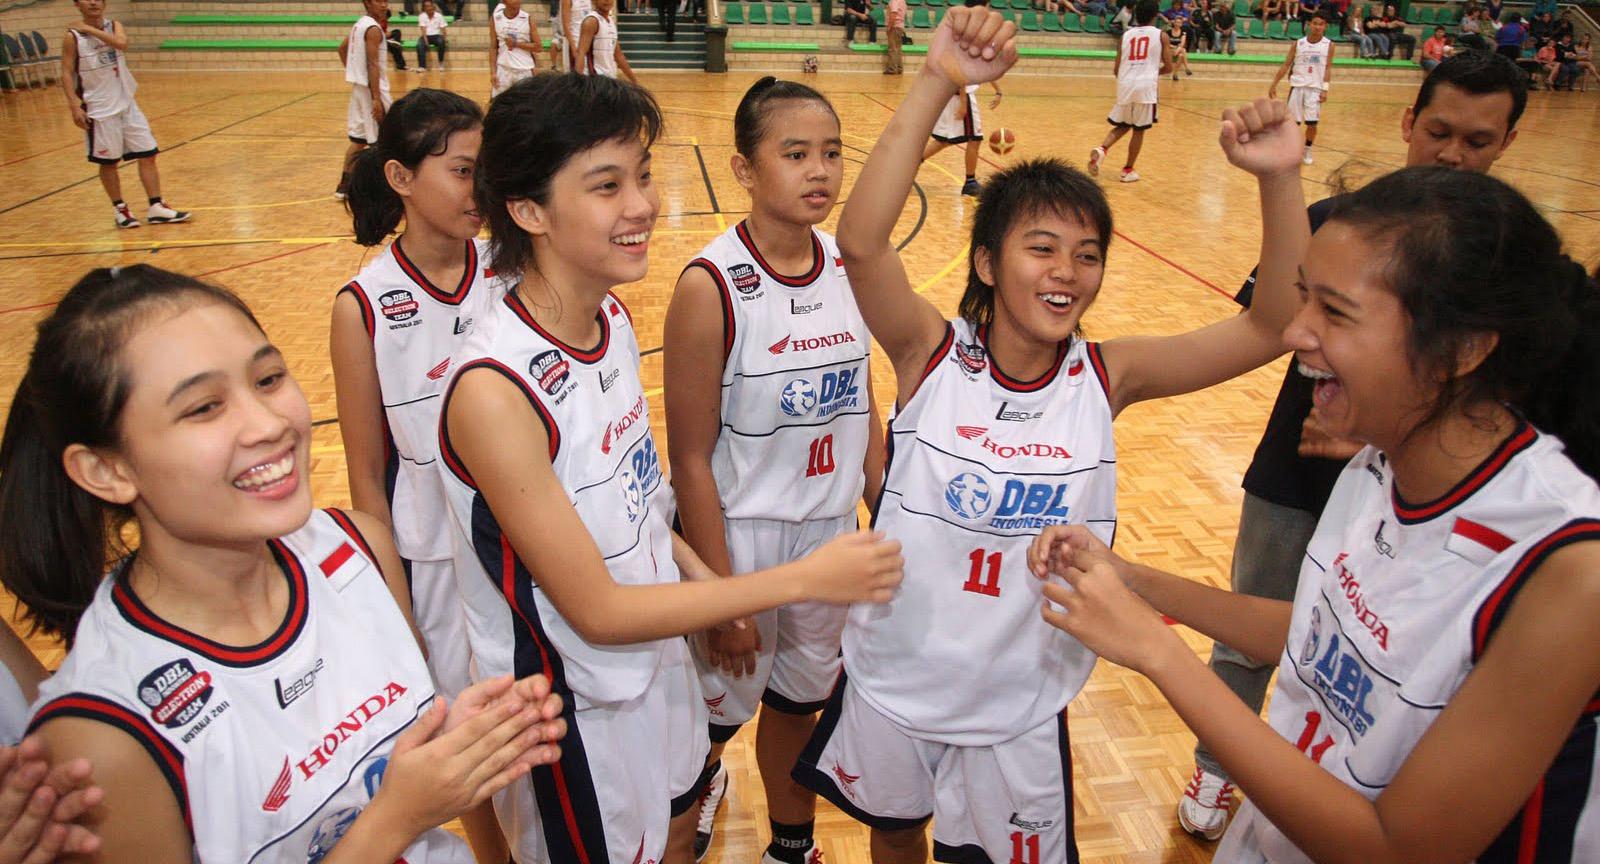 eskul siswi SMA Seksi dan Cantik keren  jaman now tim basket